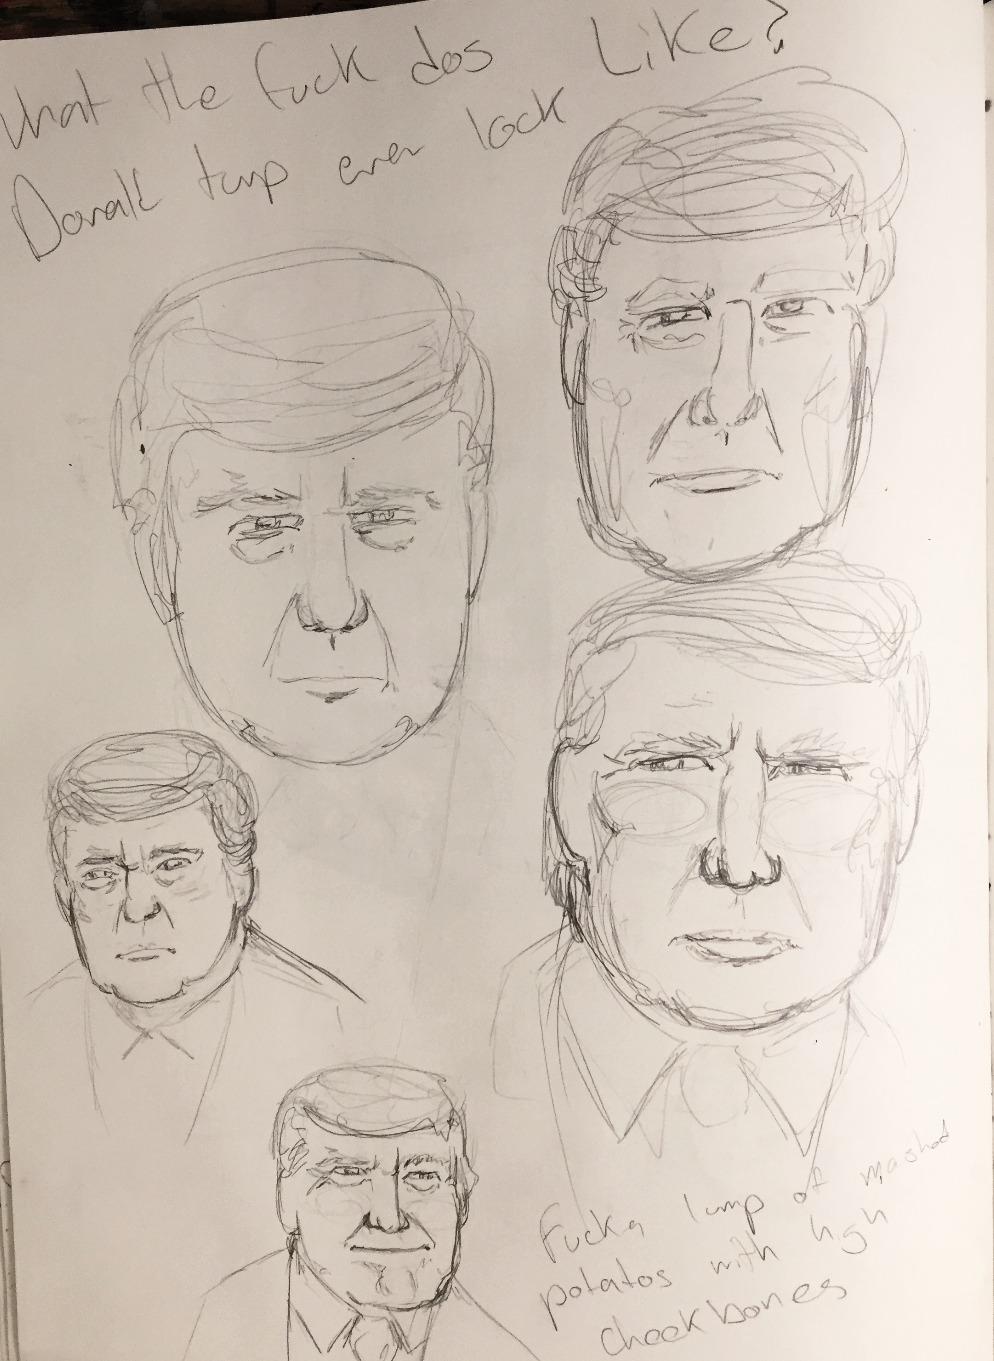 Sketch work